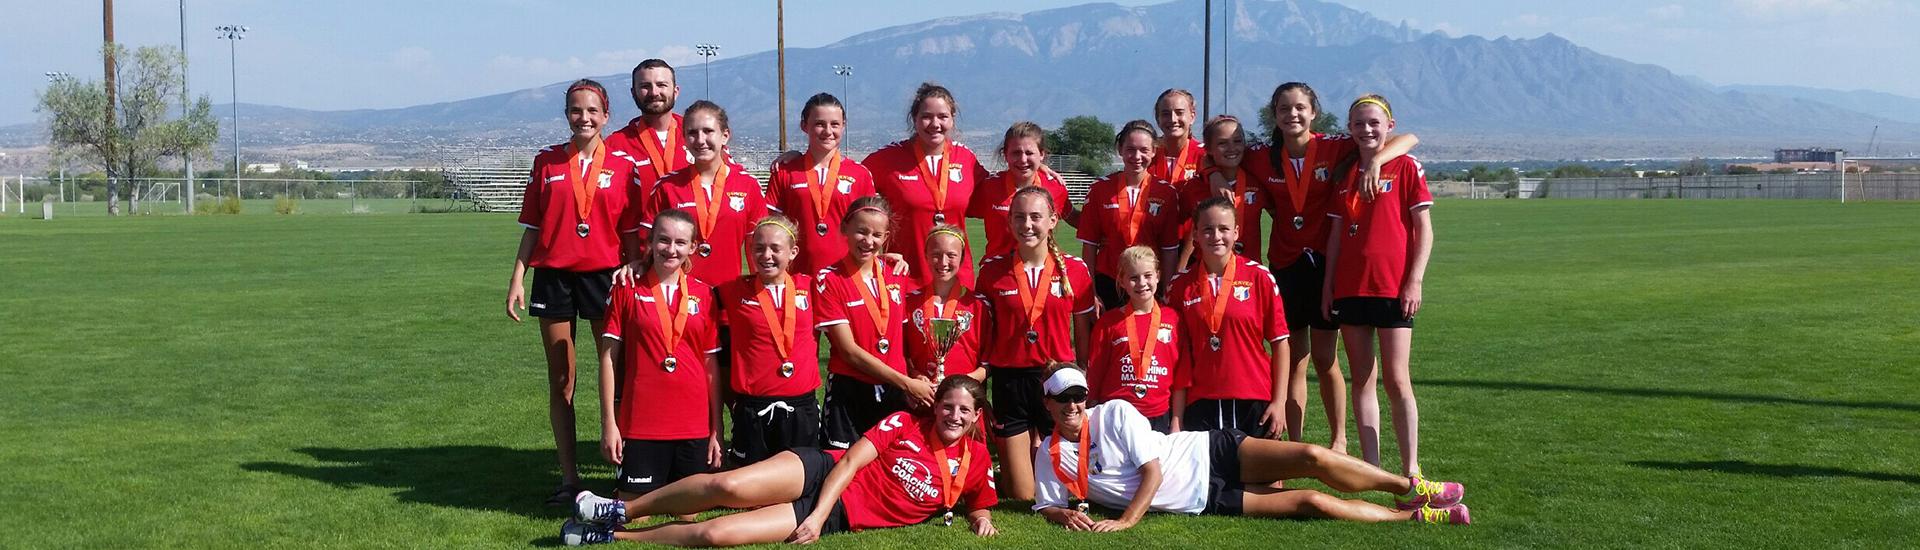 youth soccer in Denver